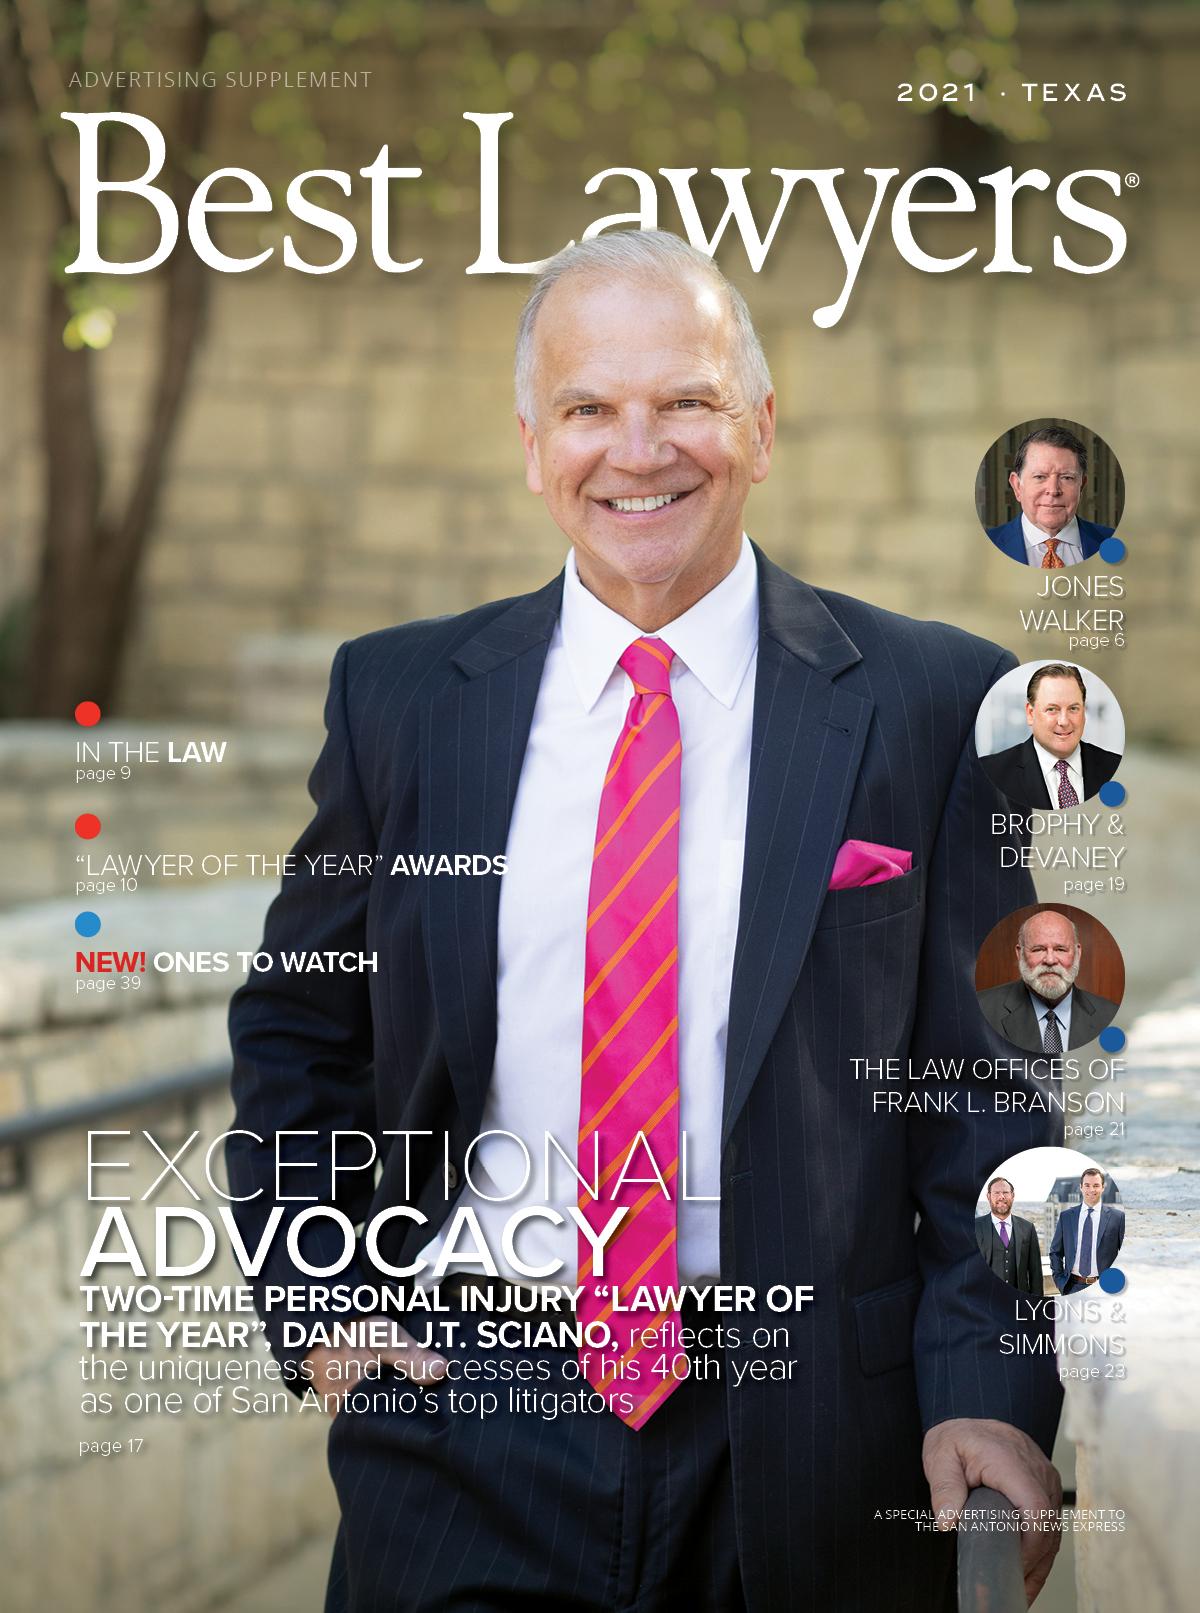 Best Lawyers in Texas